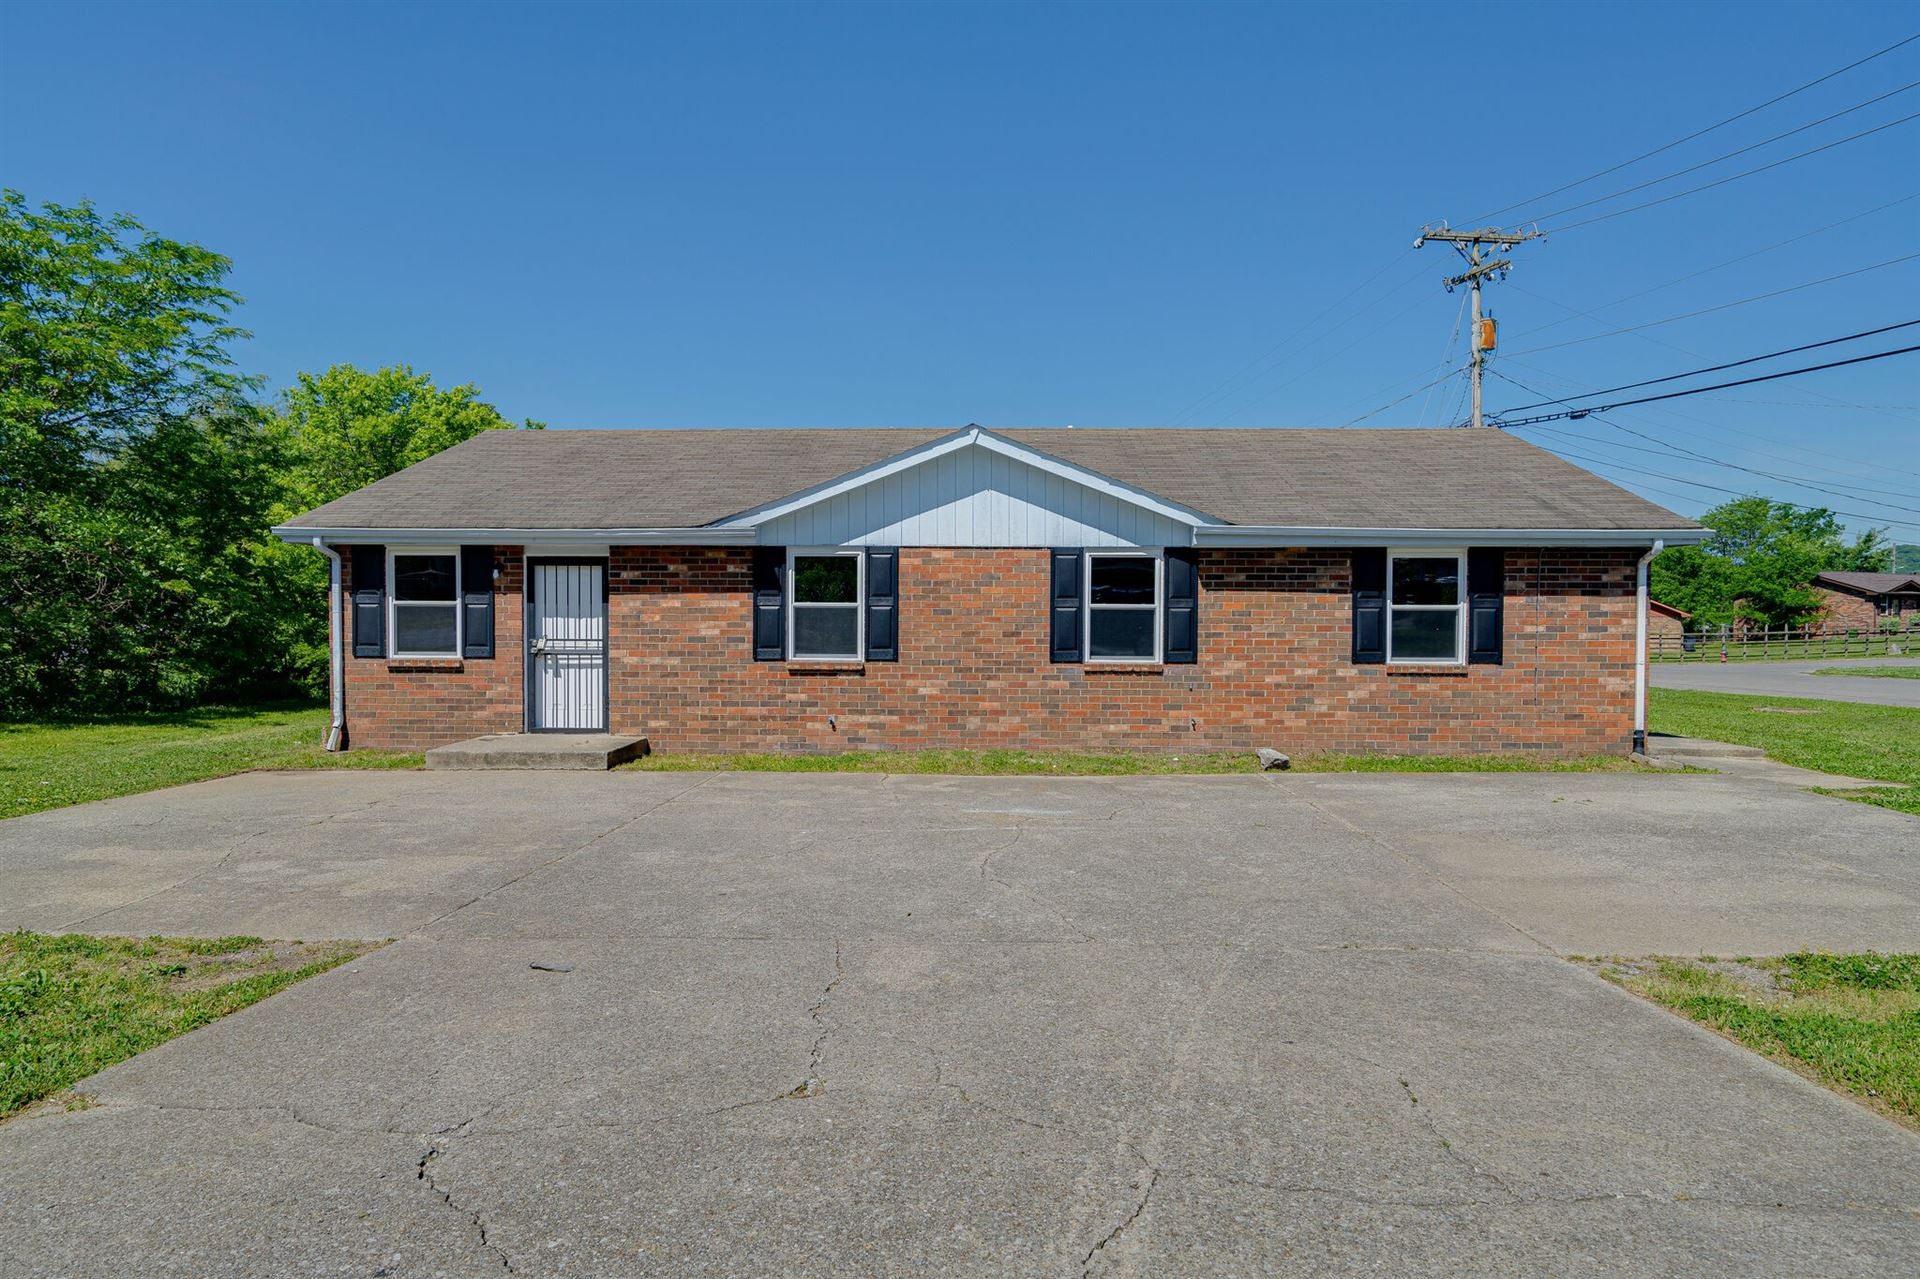 3517 Moorewood Dr, Nashville, TN 37207 - MLS#: 2255042